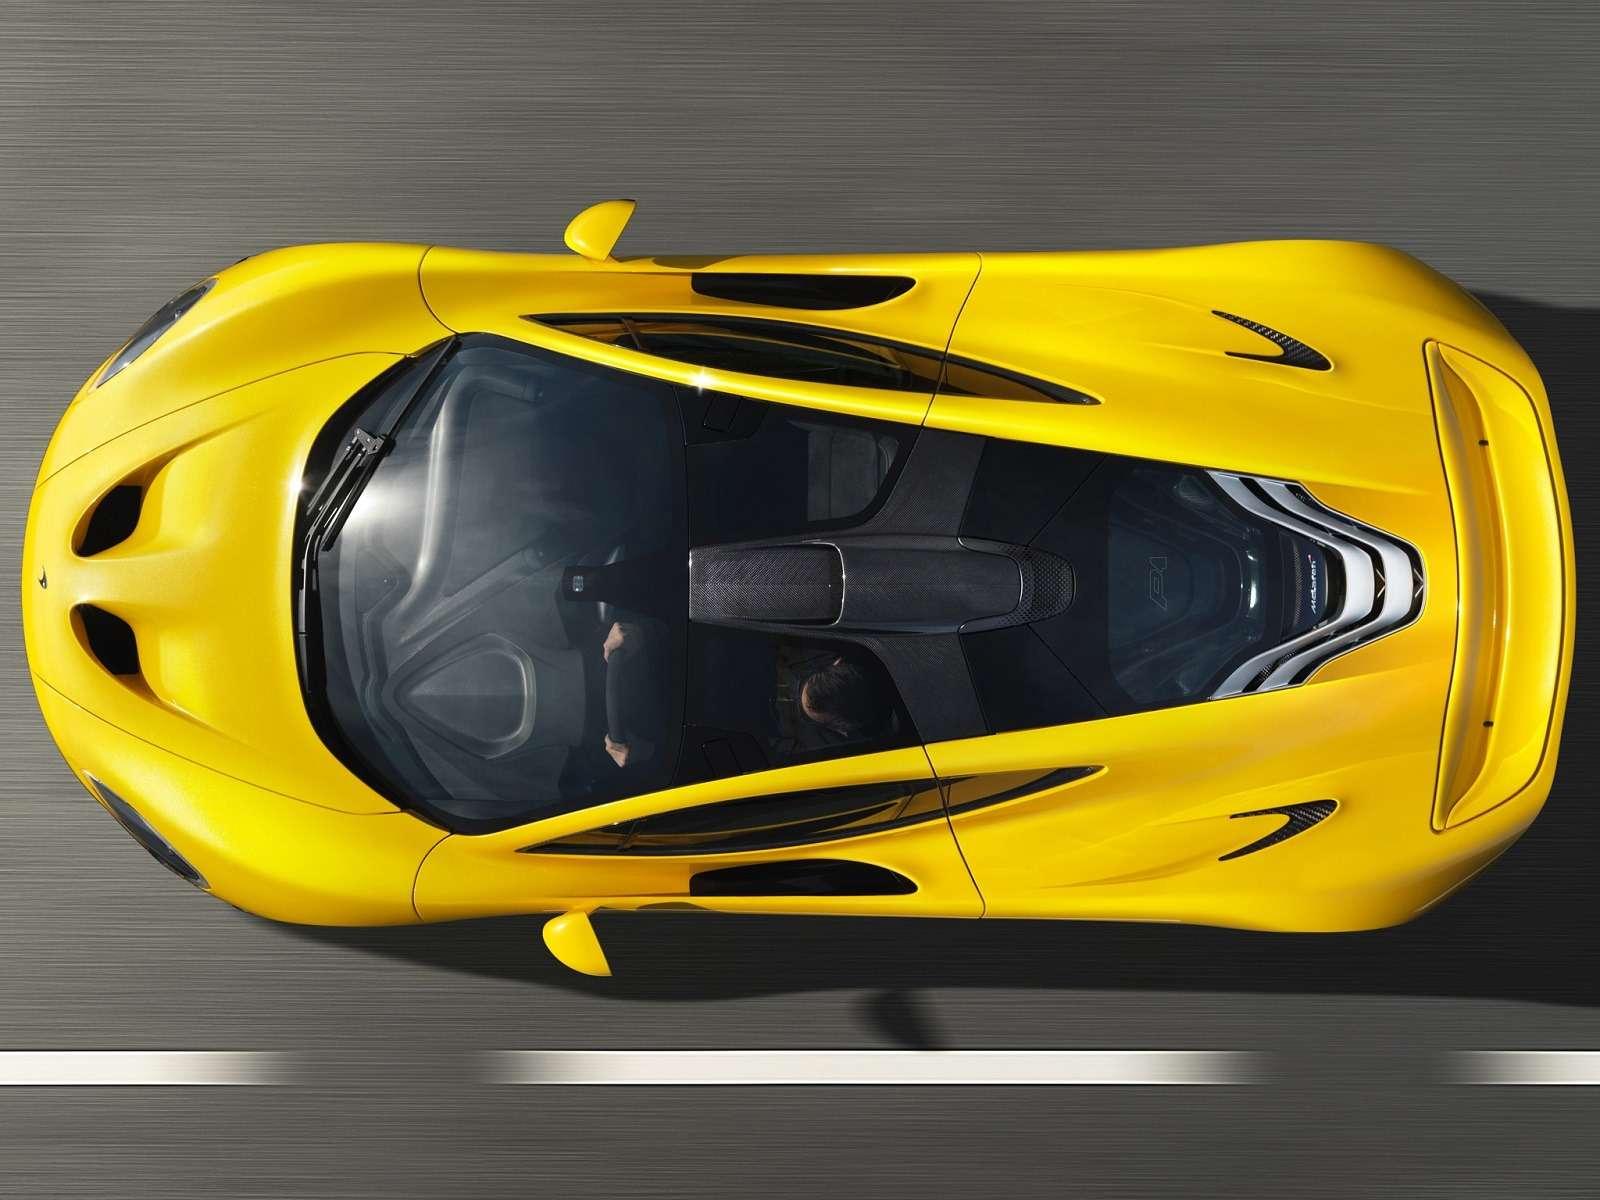 Владелец суперкара McLaren вСША попал вДТП сразу после покупки— фото 362622